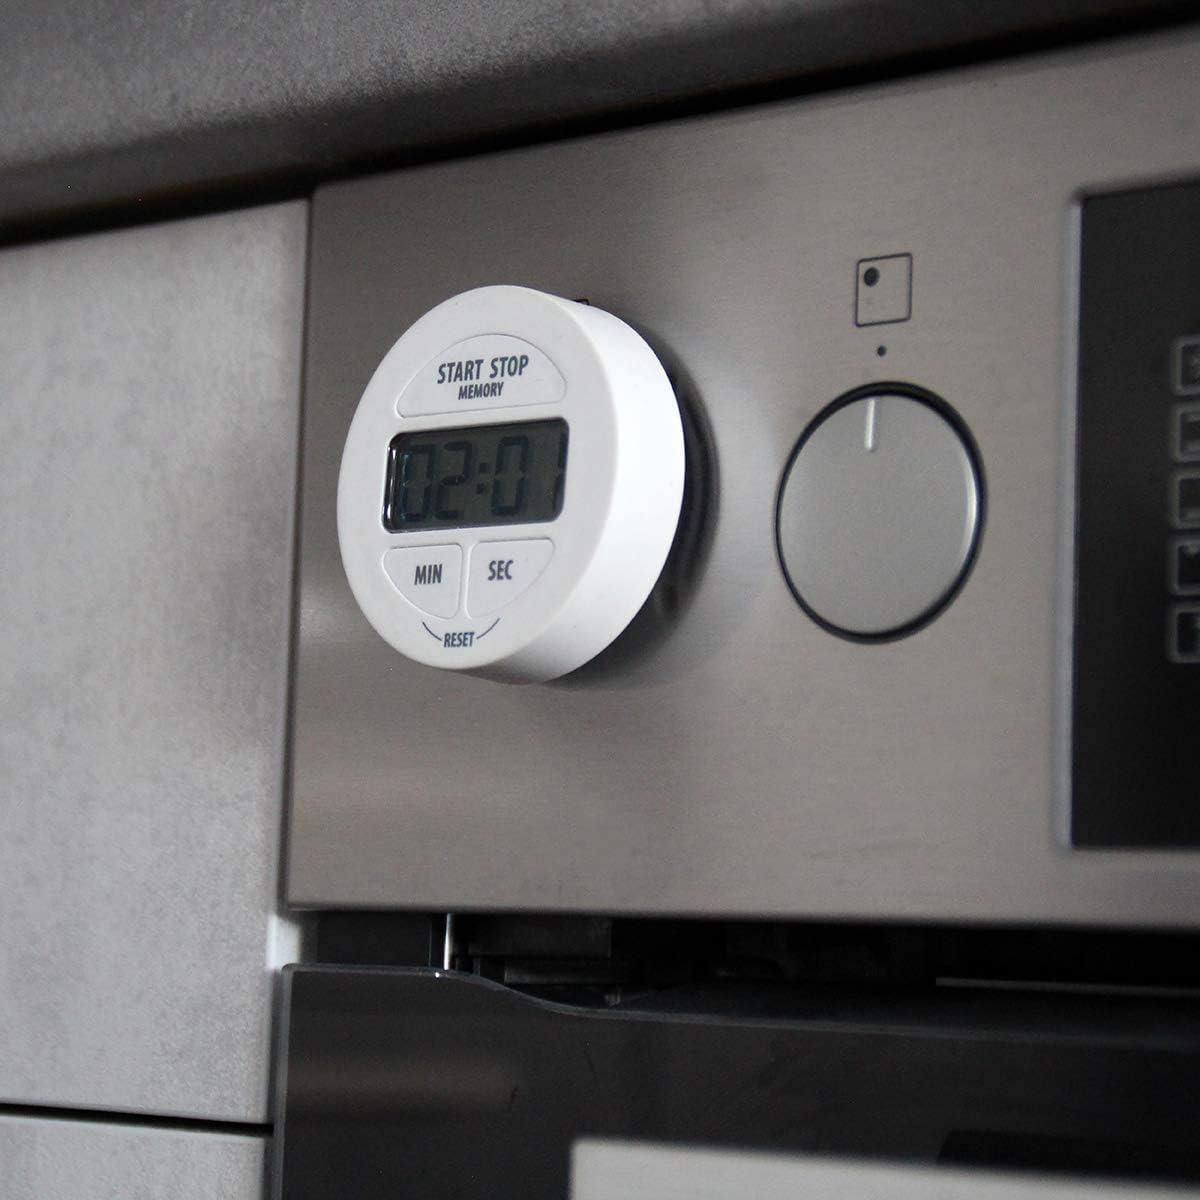 9 x 2 x 7 cm TFA Dostmann Temporizador Digital y cron/ómetro Blanco